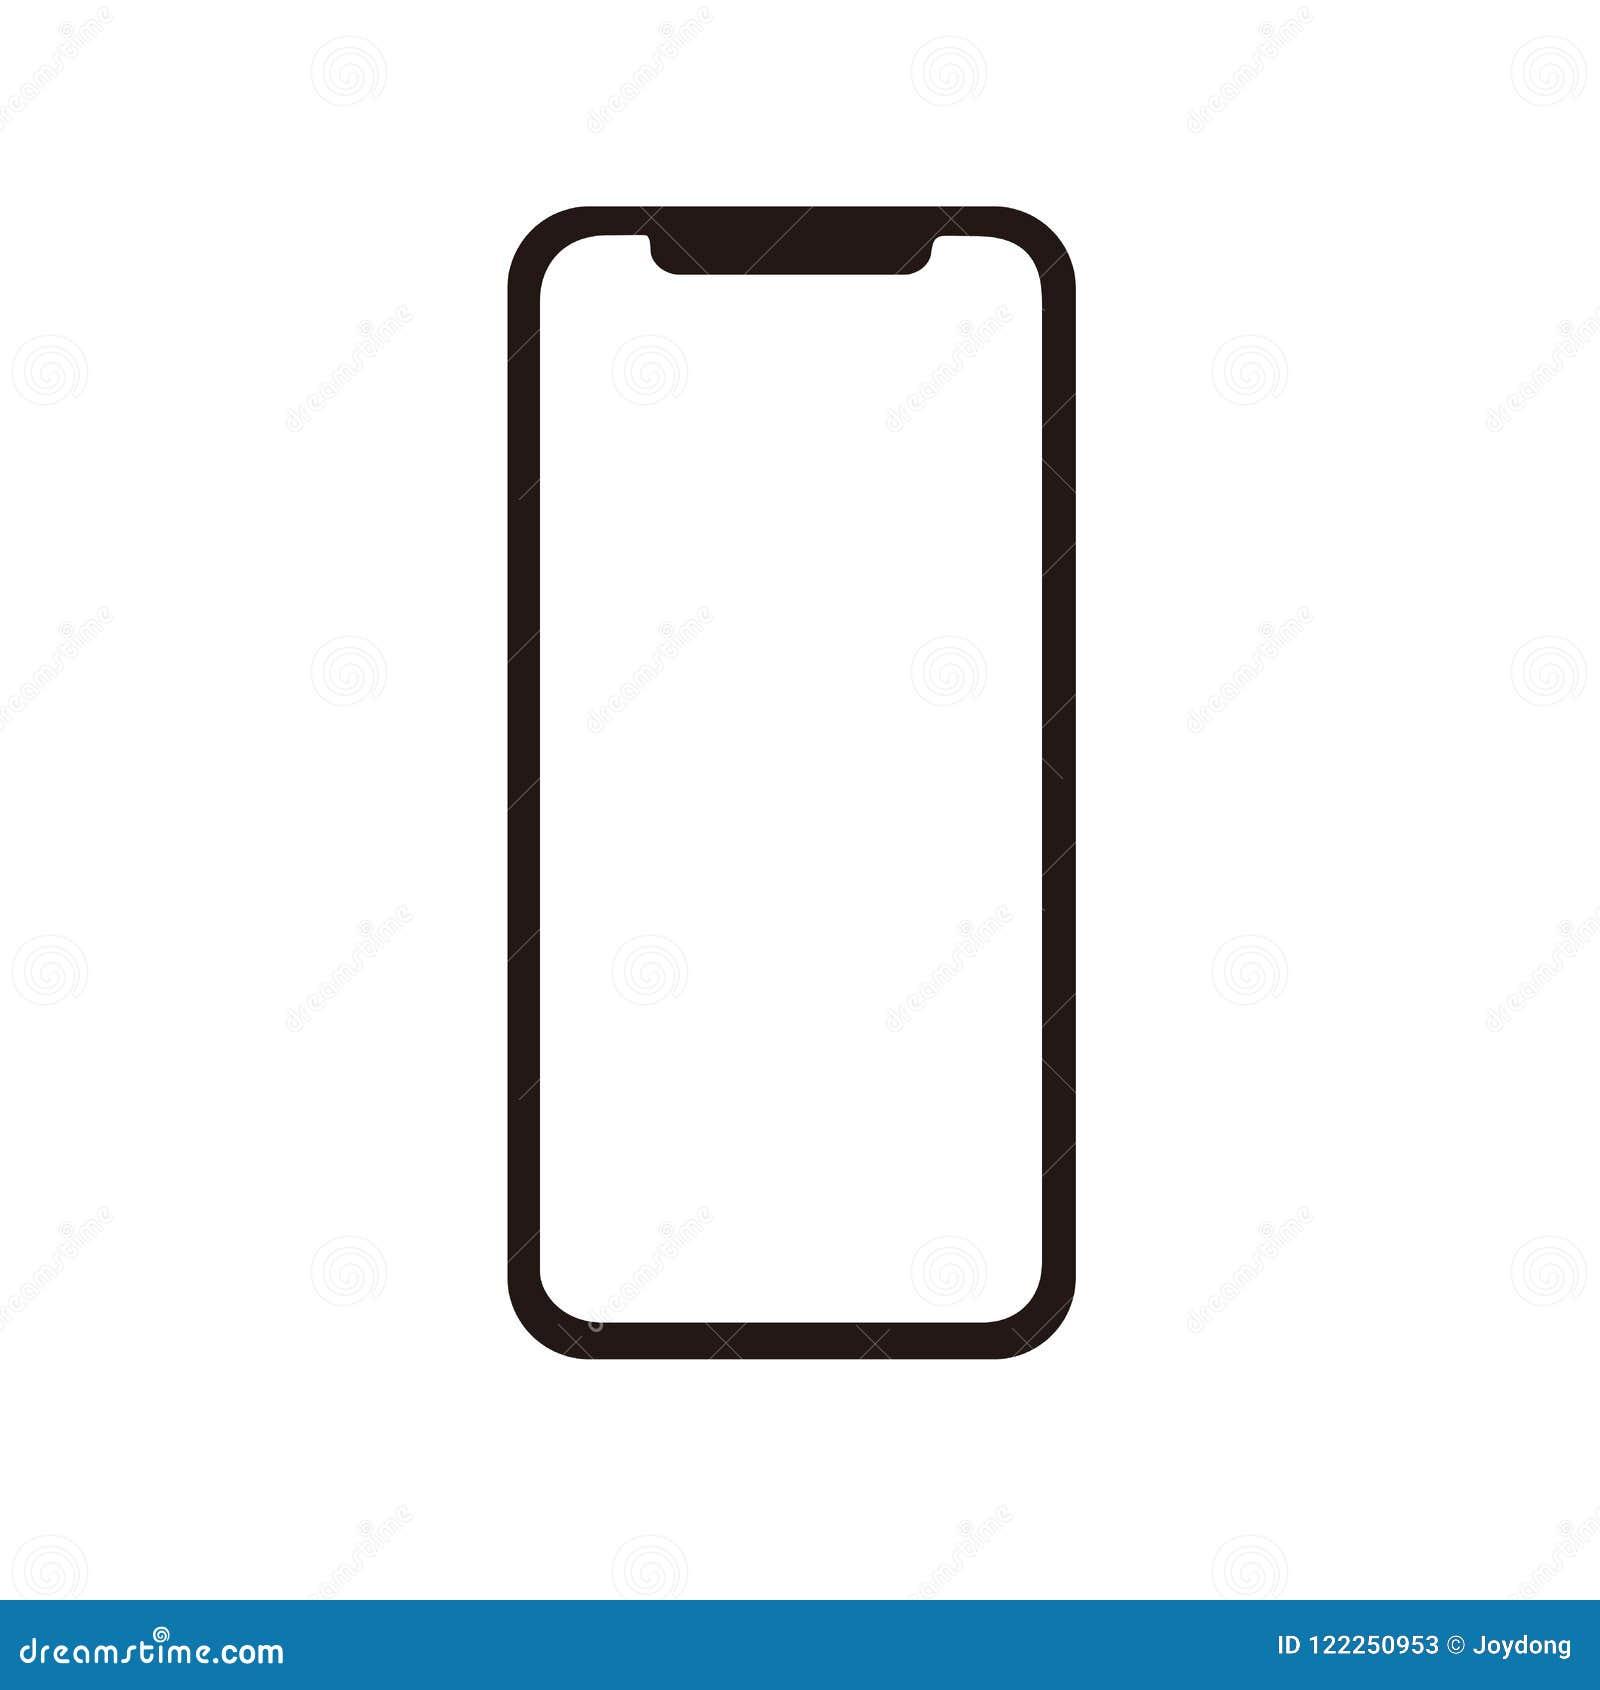 Iphone Vector Icon